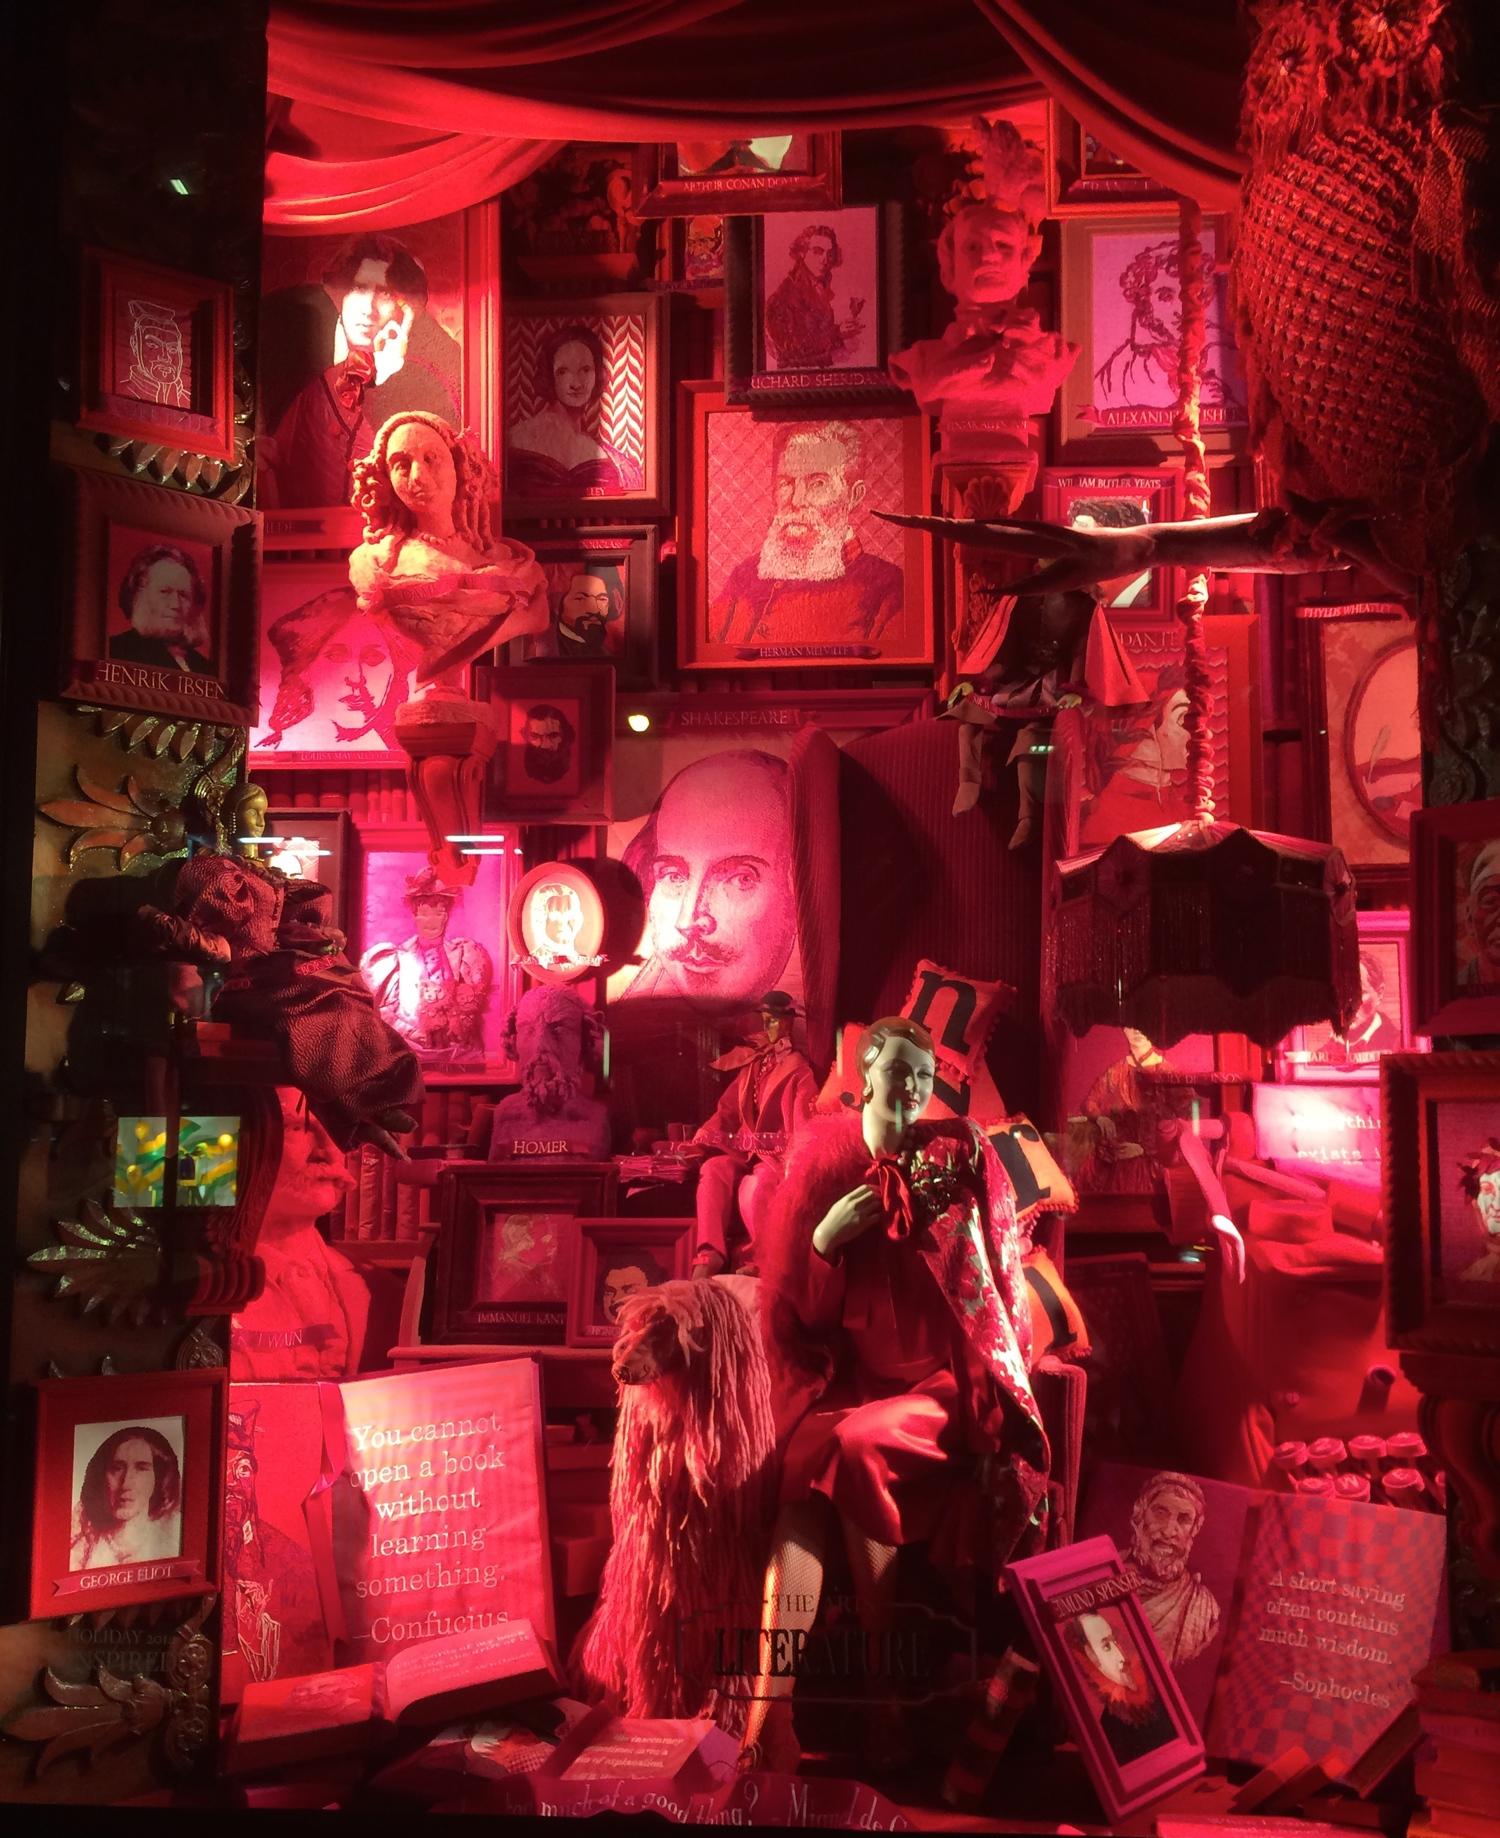 Bergdoff Goodman's Window Display - Christmas 2014